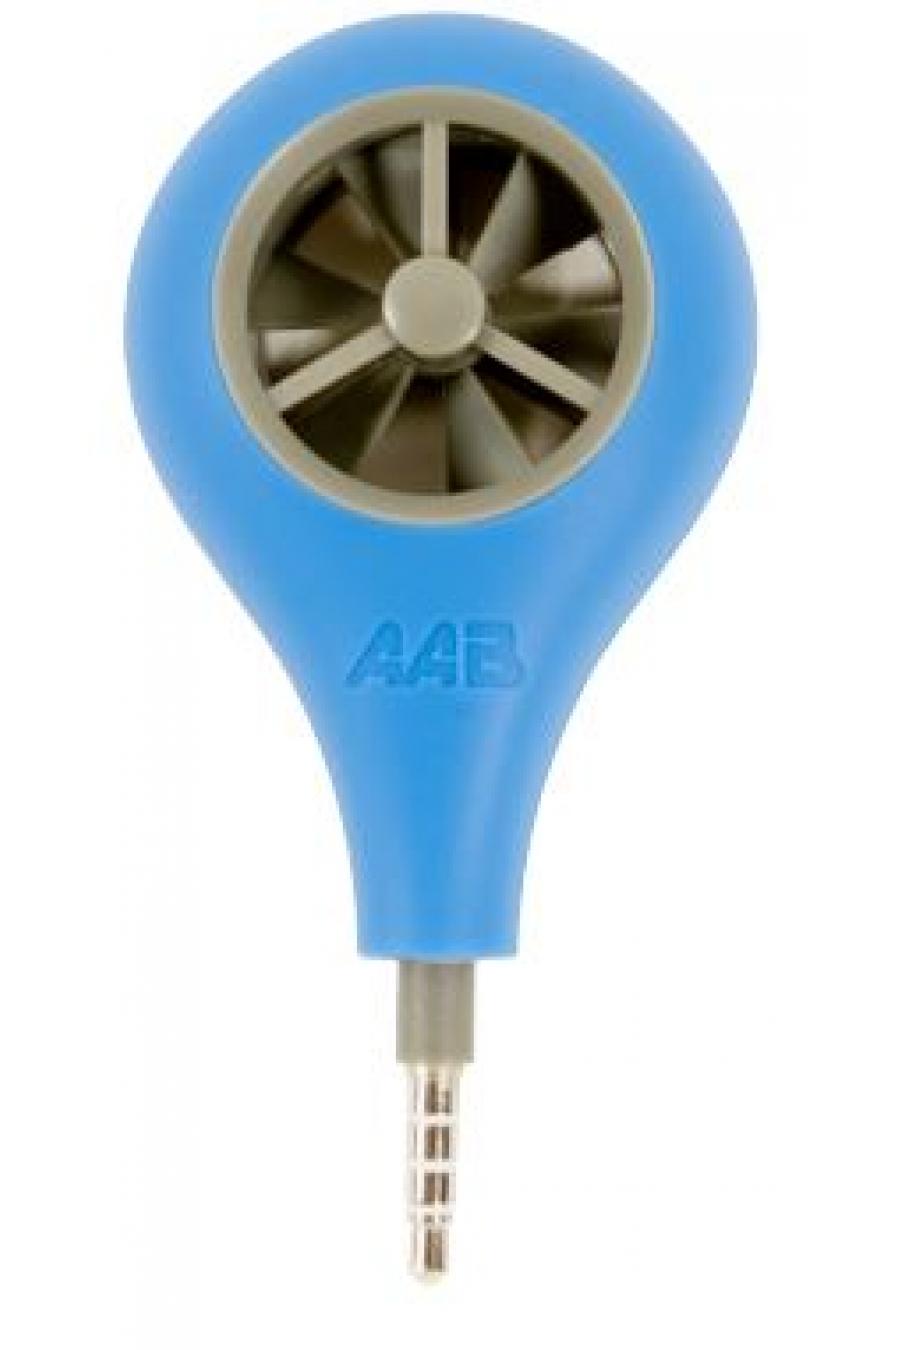 AAB Akıllı Hava Hızı / Debisi Ölçüm Cihazı ABM-100